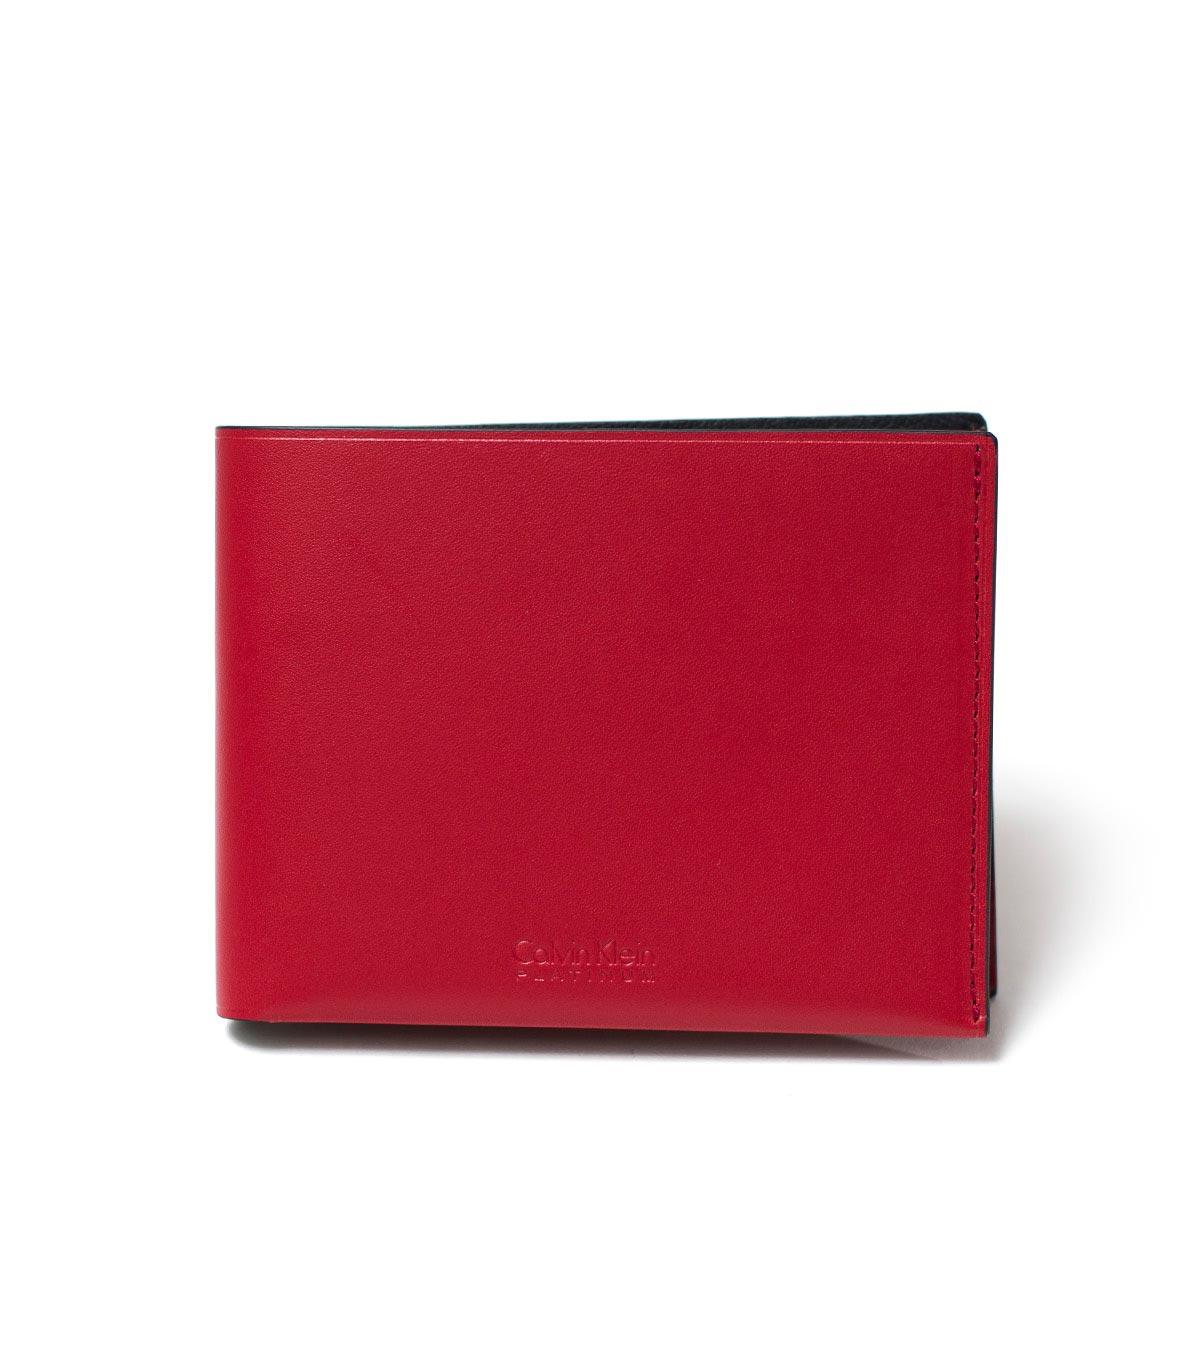 821013fc4074 グレ メンズ二つ折り財布 - 価格.com